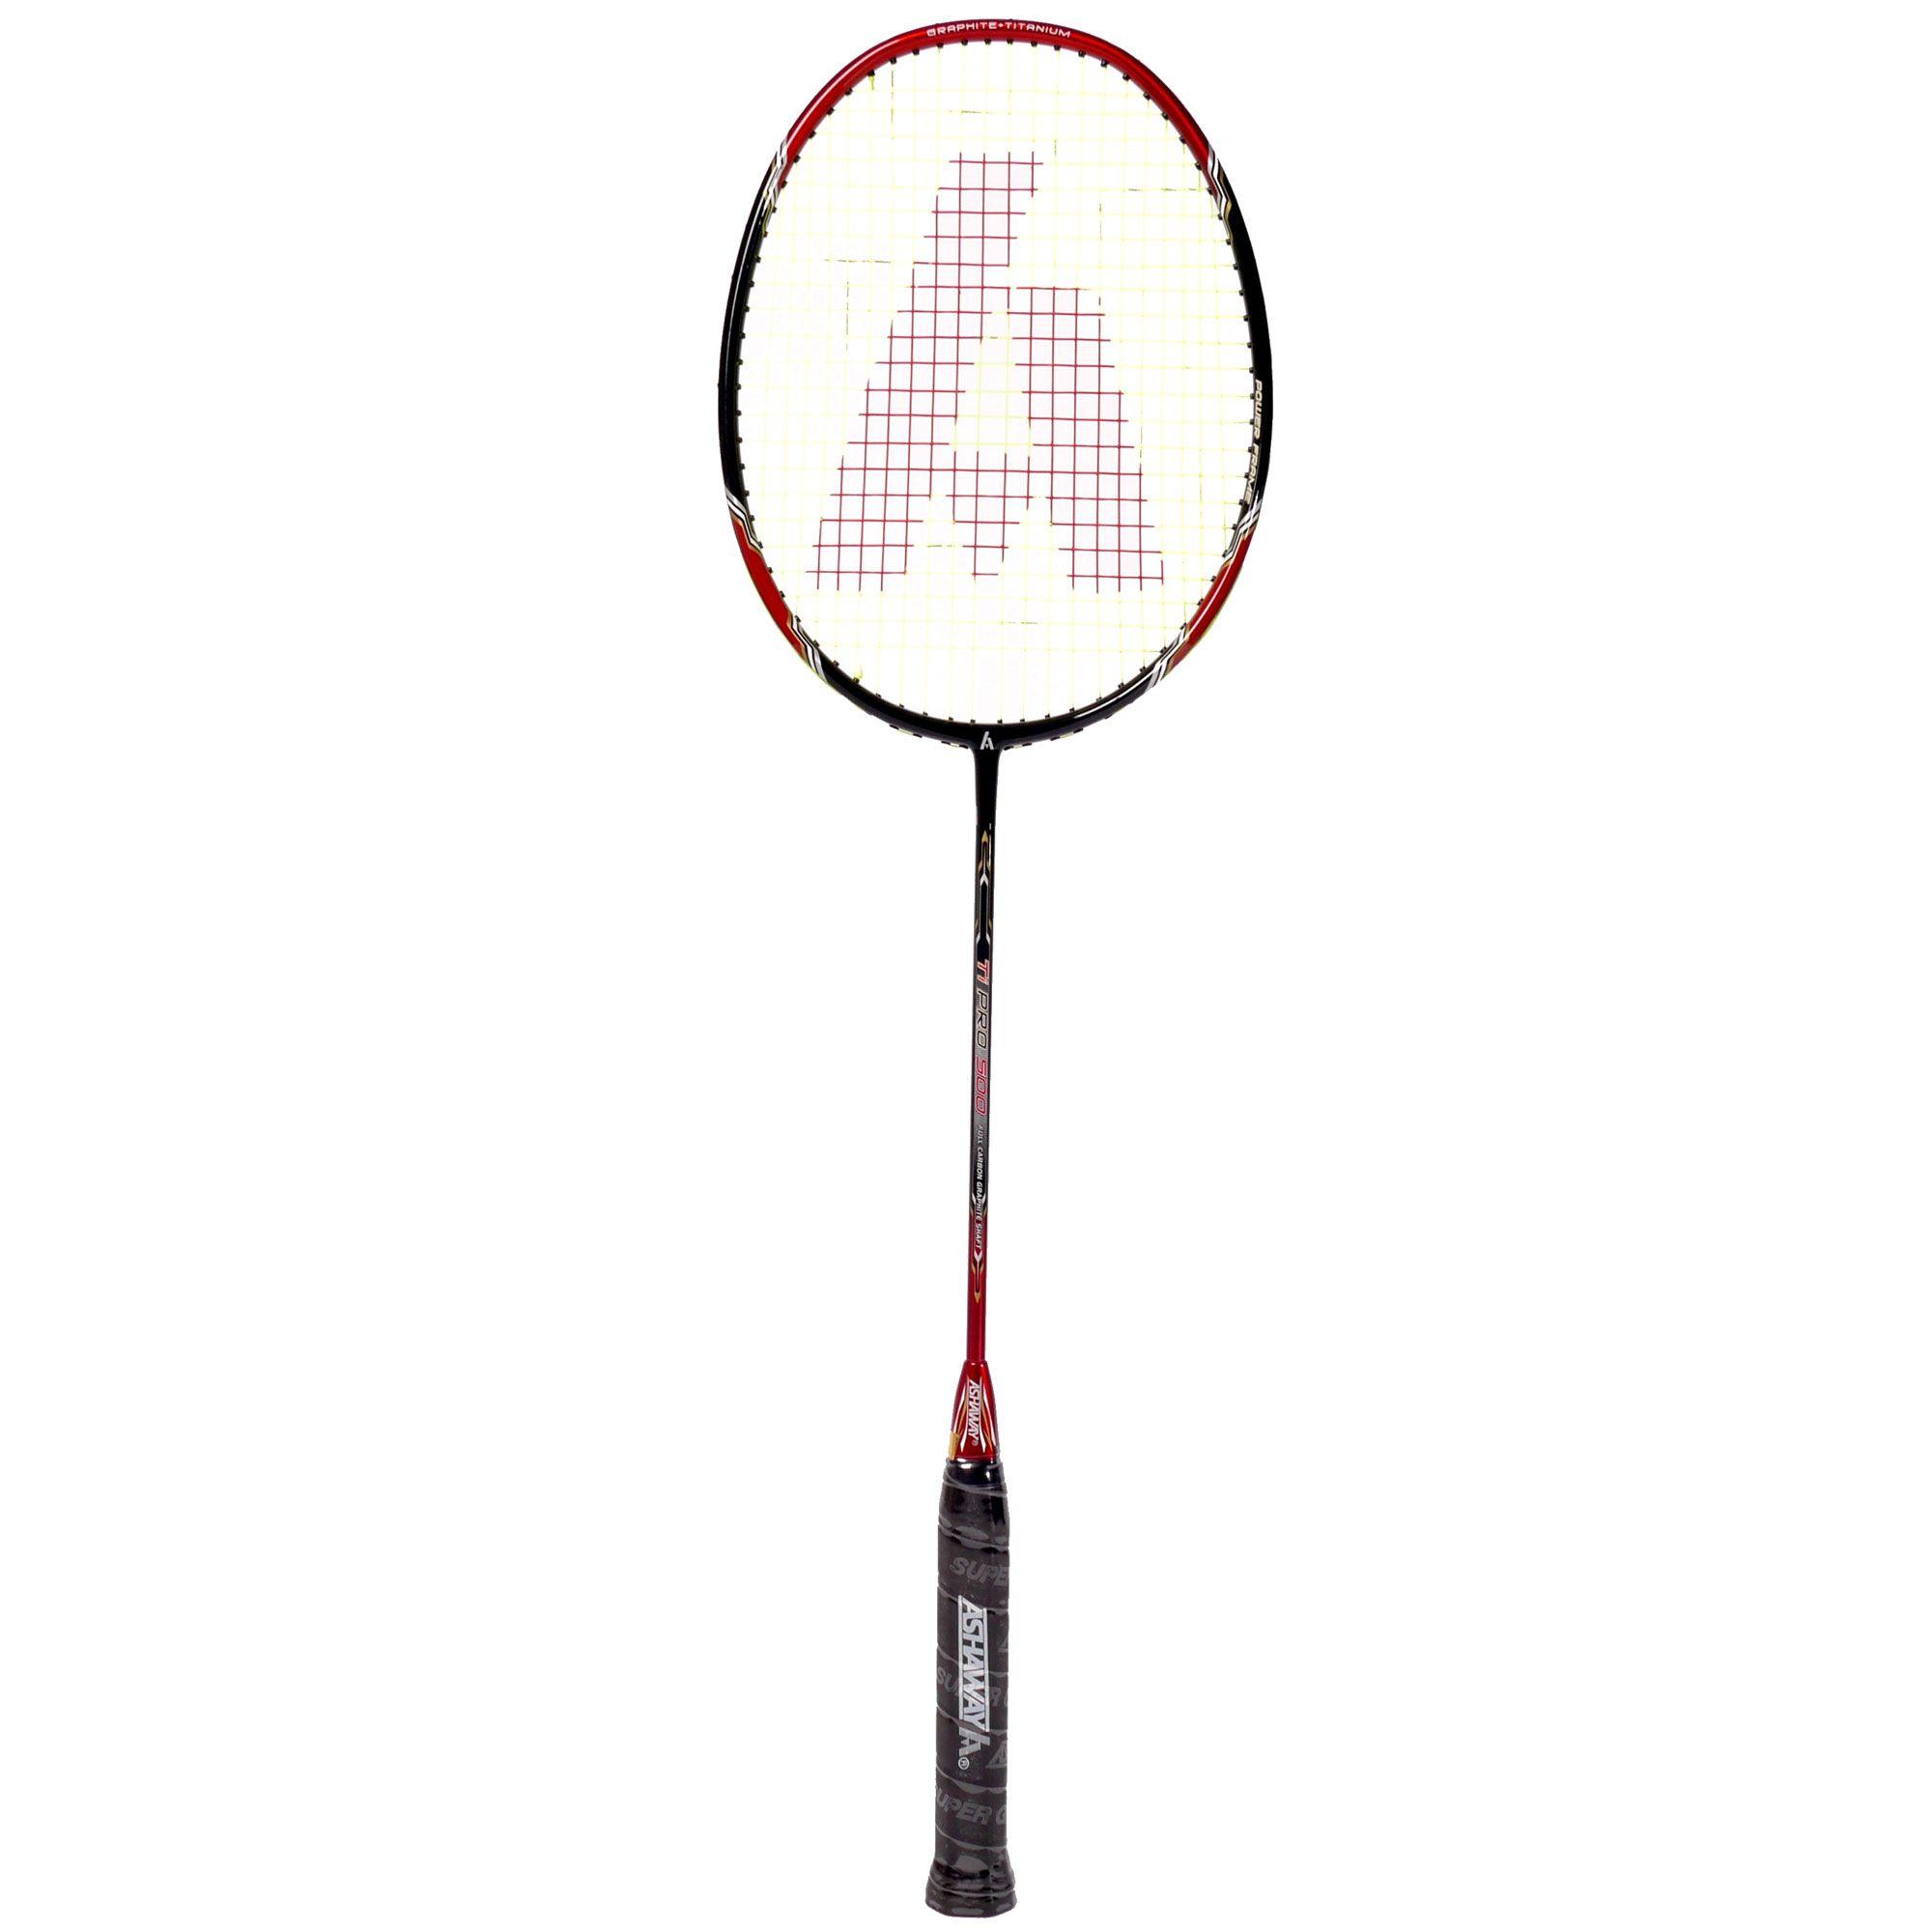 Ashaway Ti Pro 500 Badminton Racket - Sweatband.com